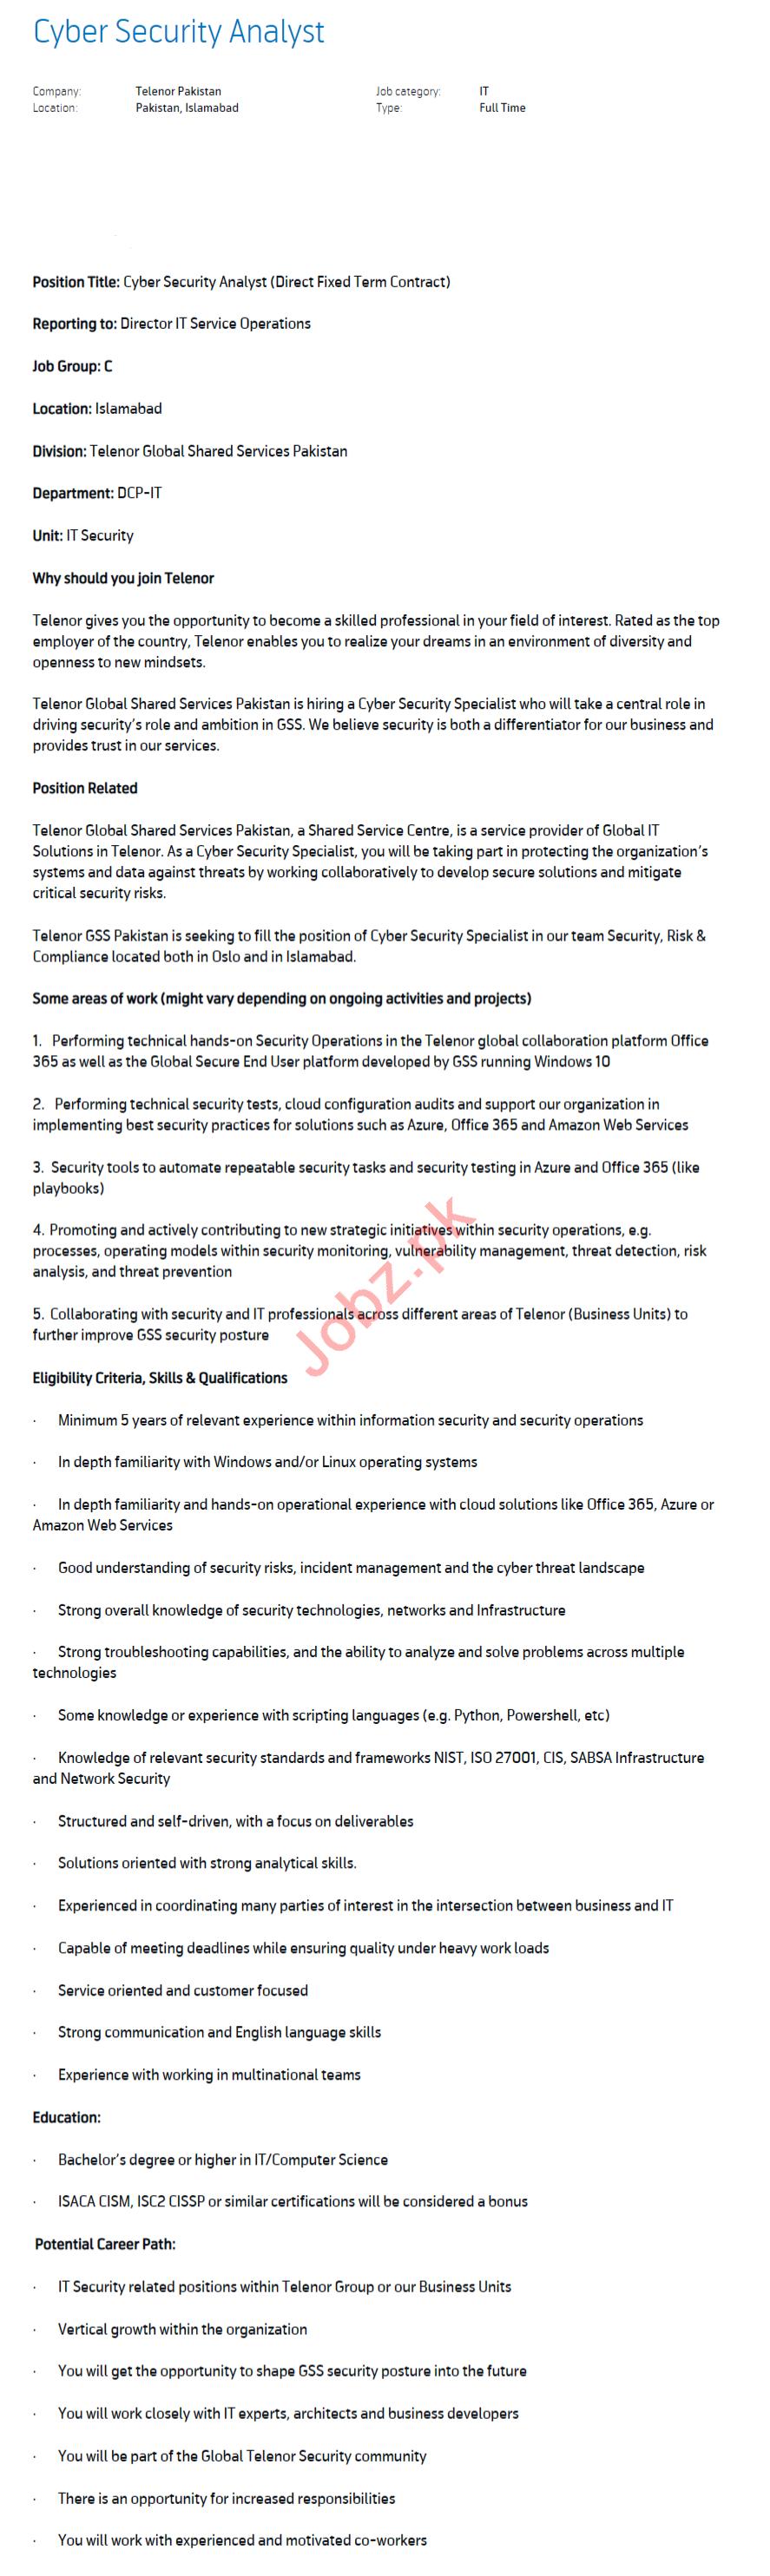 Cyber Security Analyst Jobs 2020 Telenor Pakistan